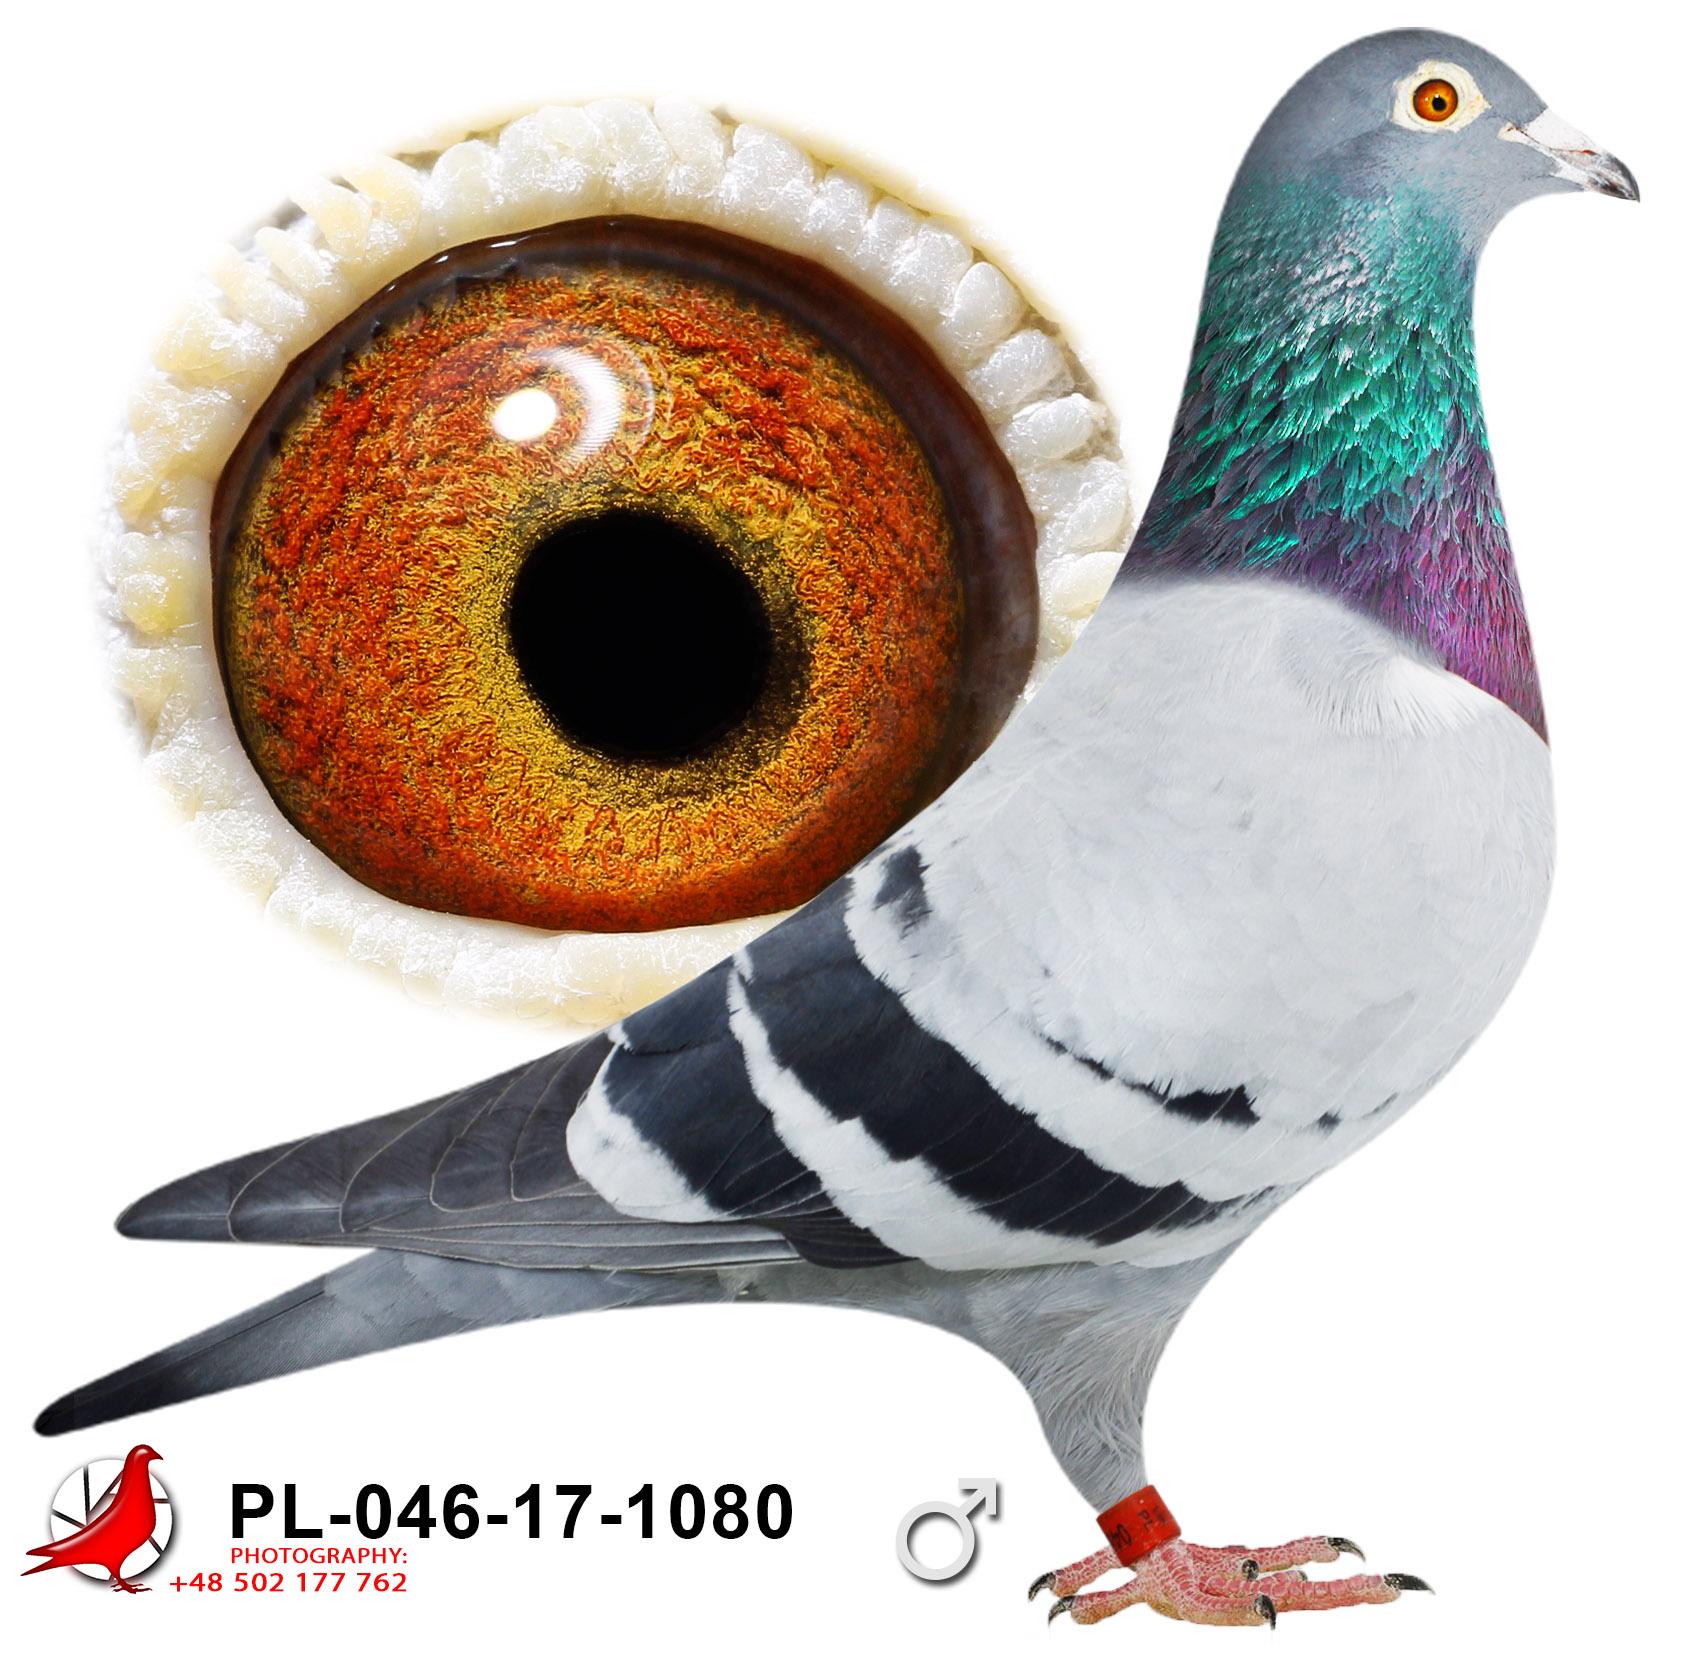 pl-046-17-1080_c